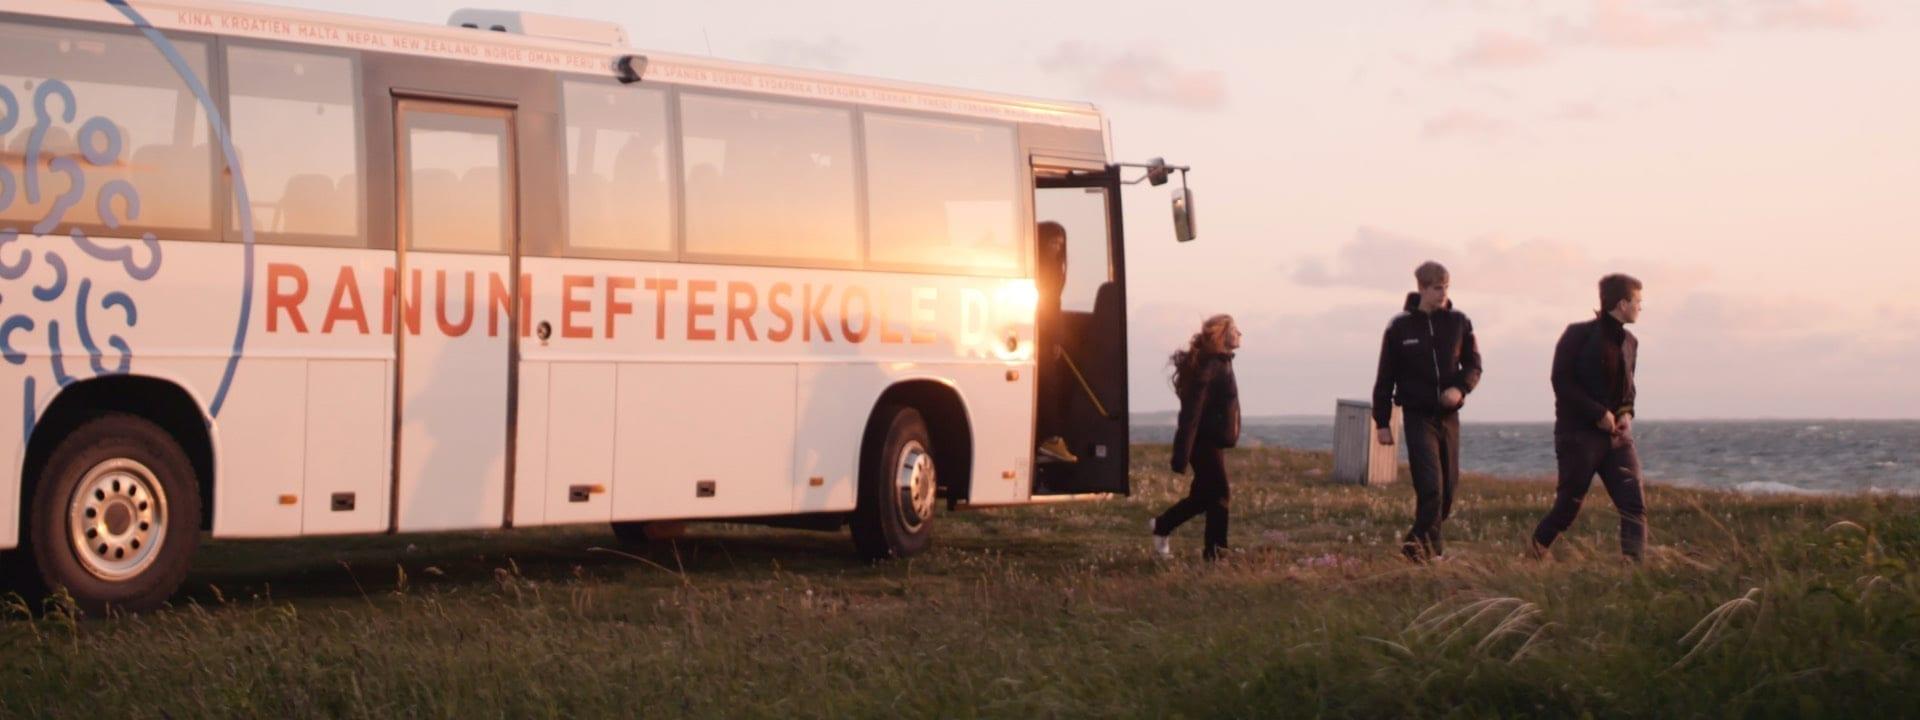 Tur til Rønbjerg ved solnedgang